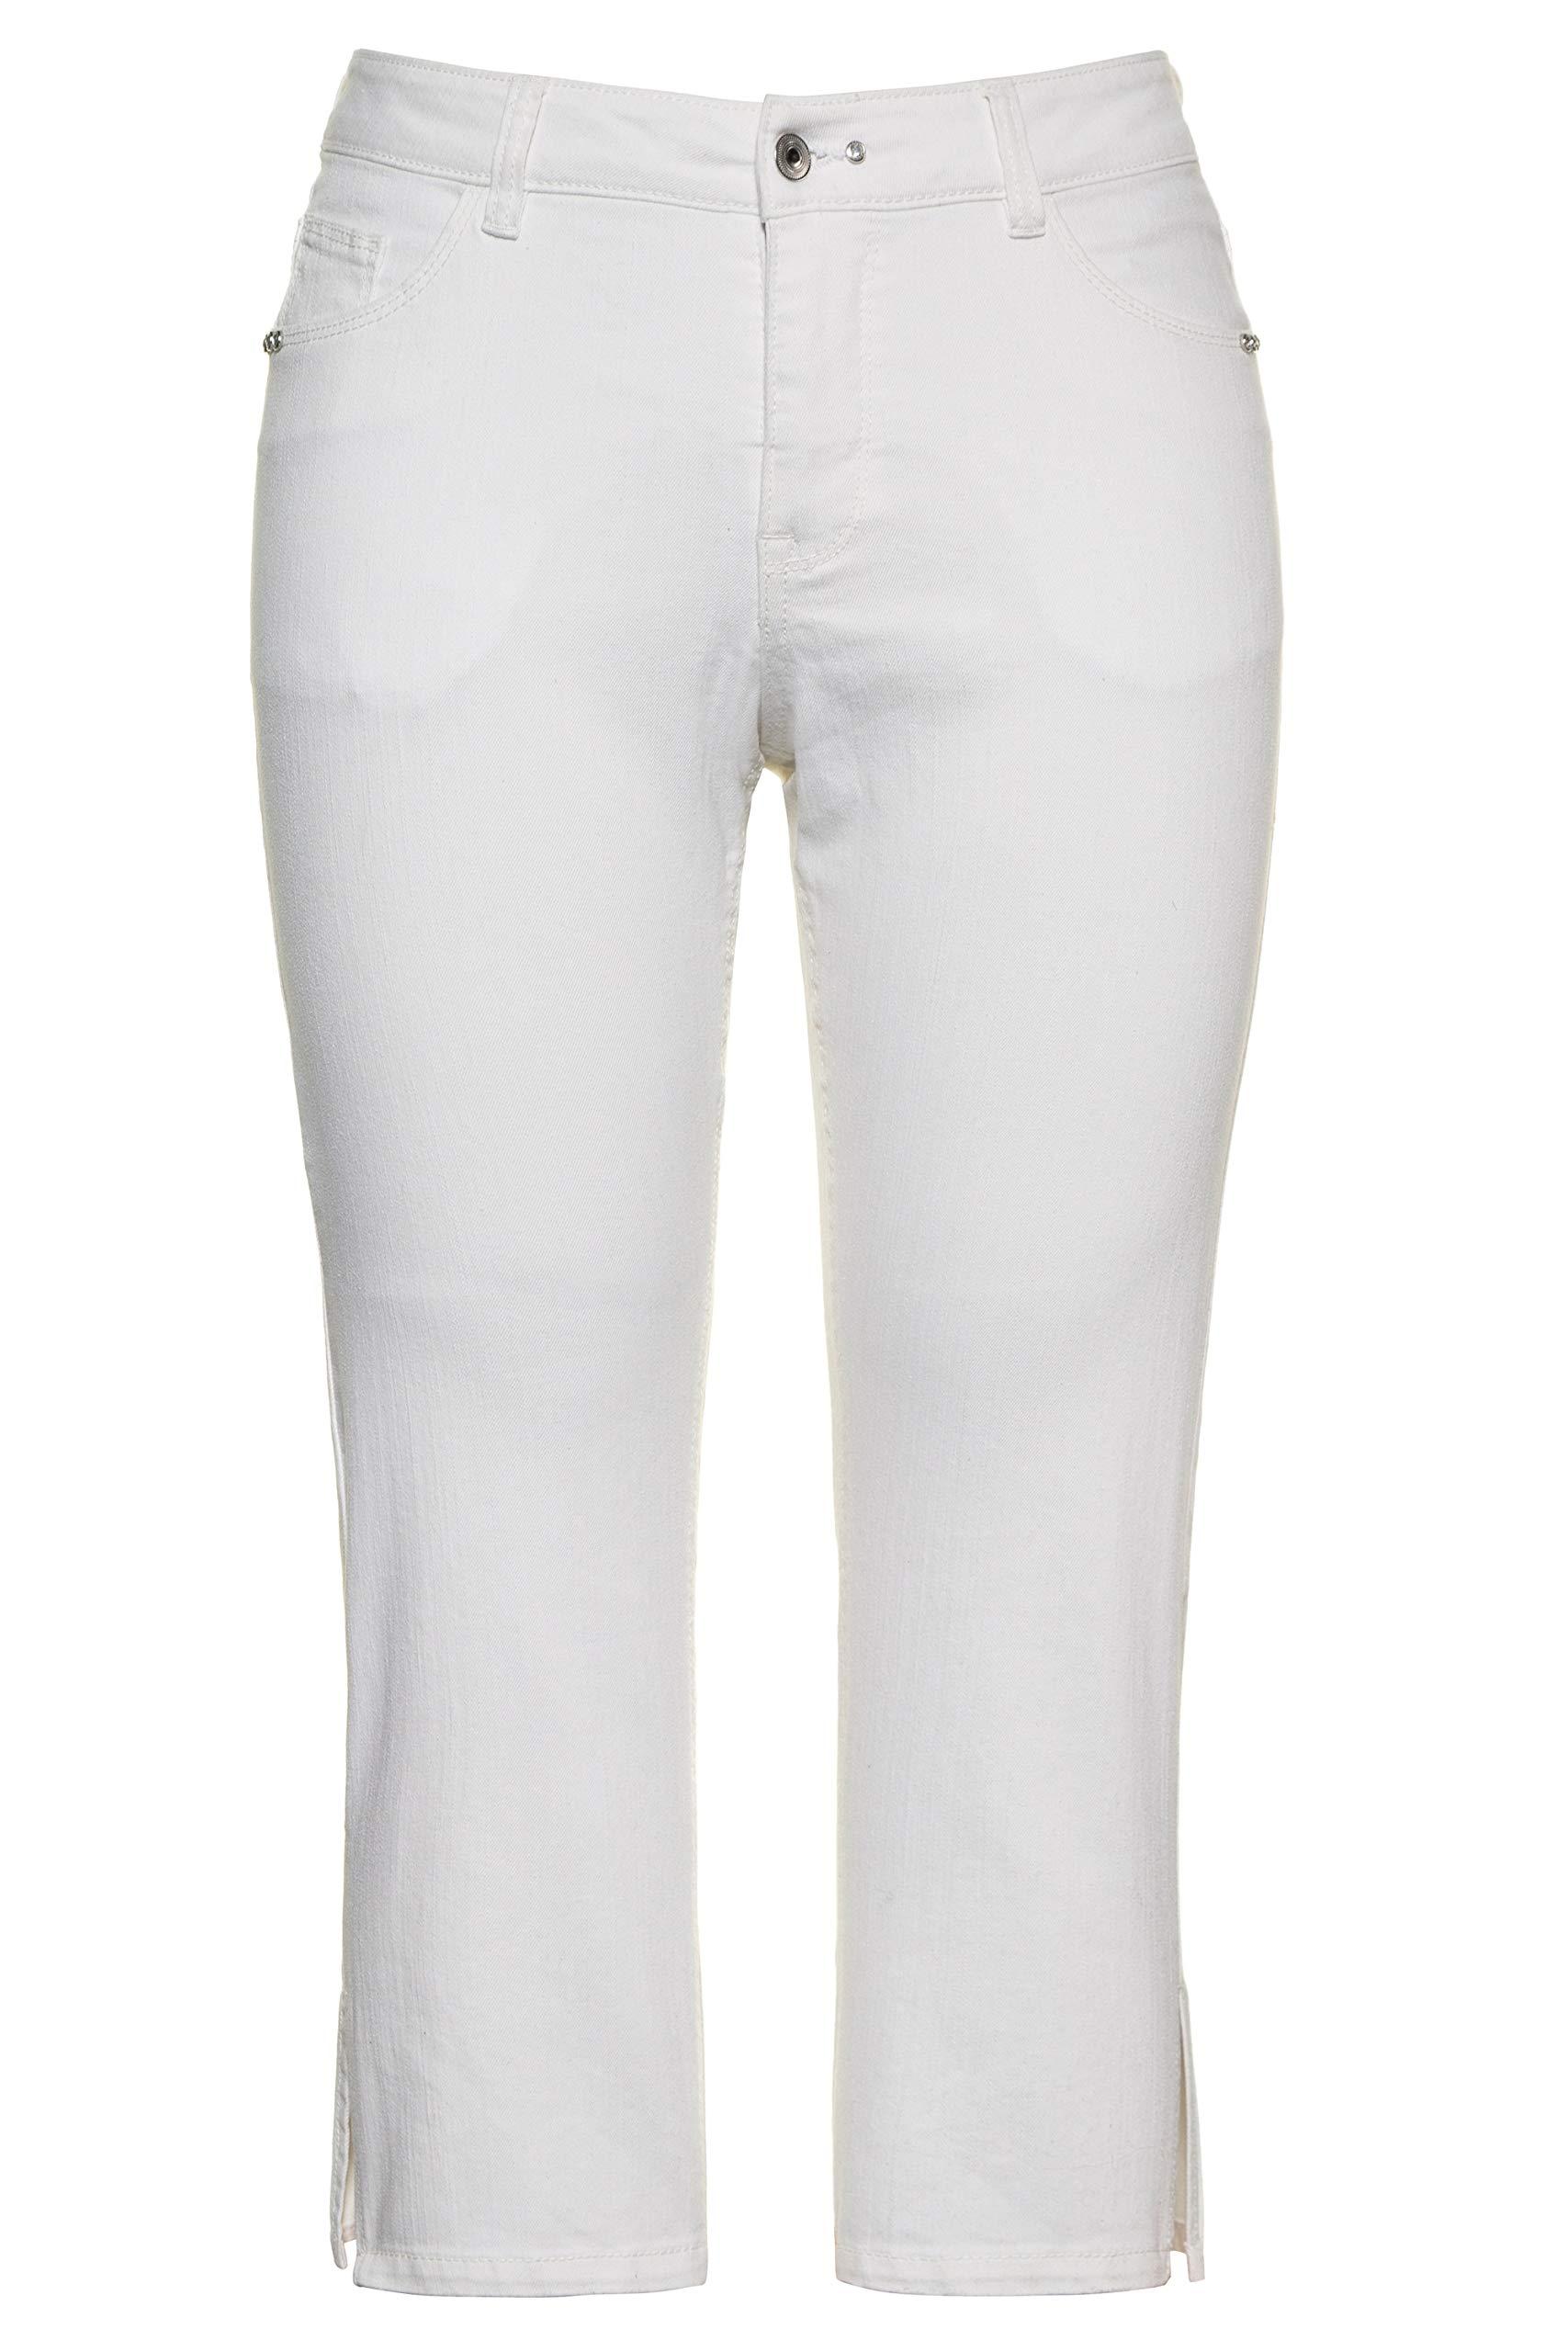 Femme Grandes Tailles Jean 7/8 Sammy, Rivets, Jambe Droite 747312